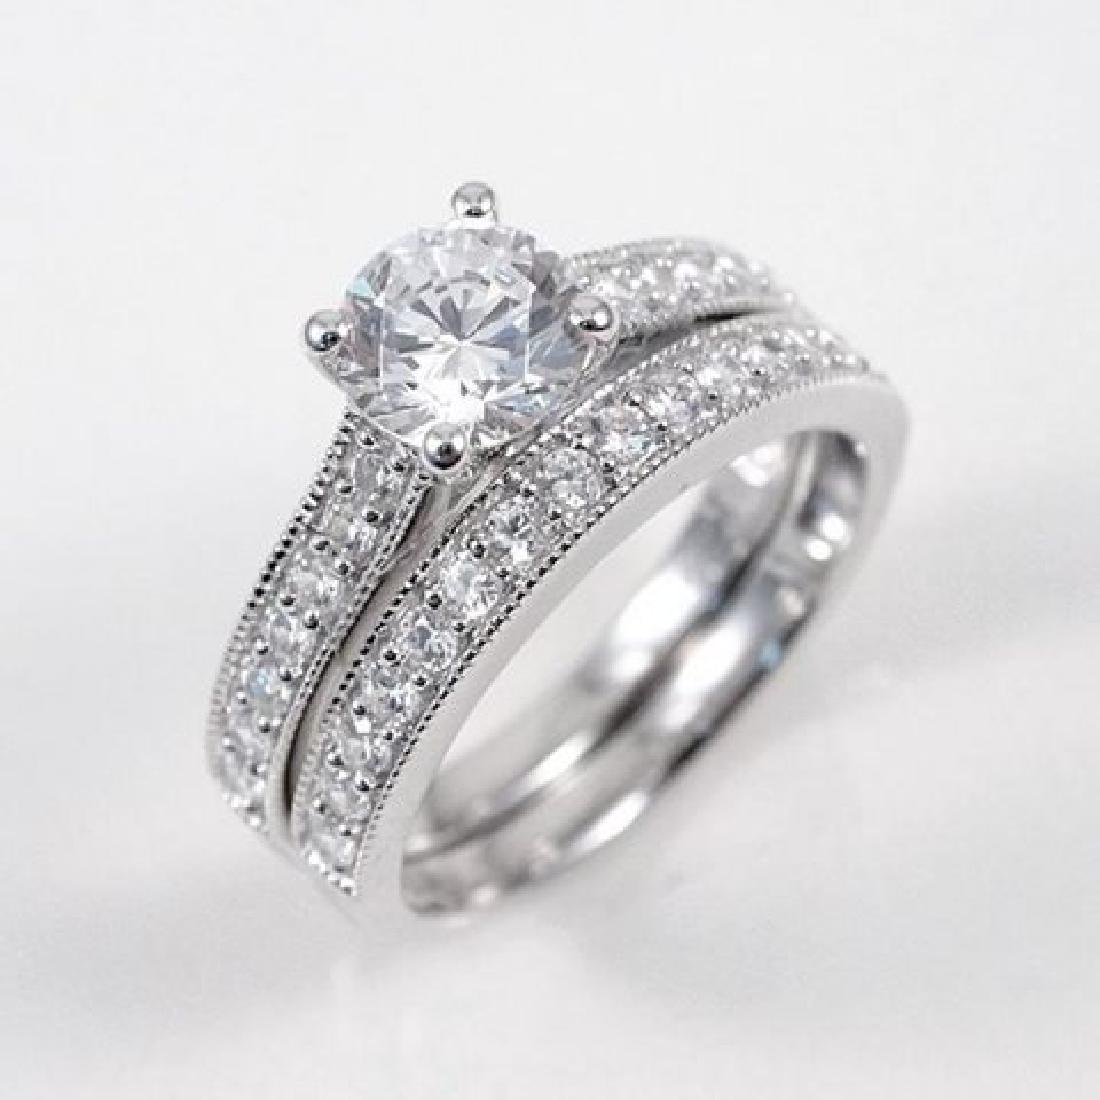 Creation Diamond Ring 1.88 Carat 14k W/g Overlay - 2